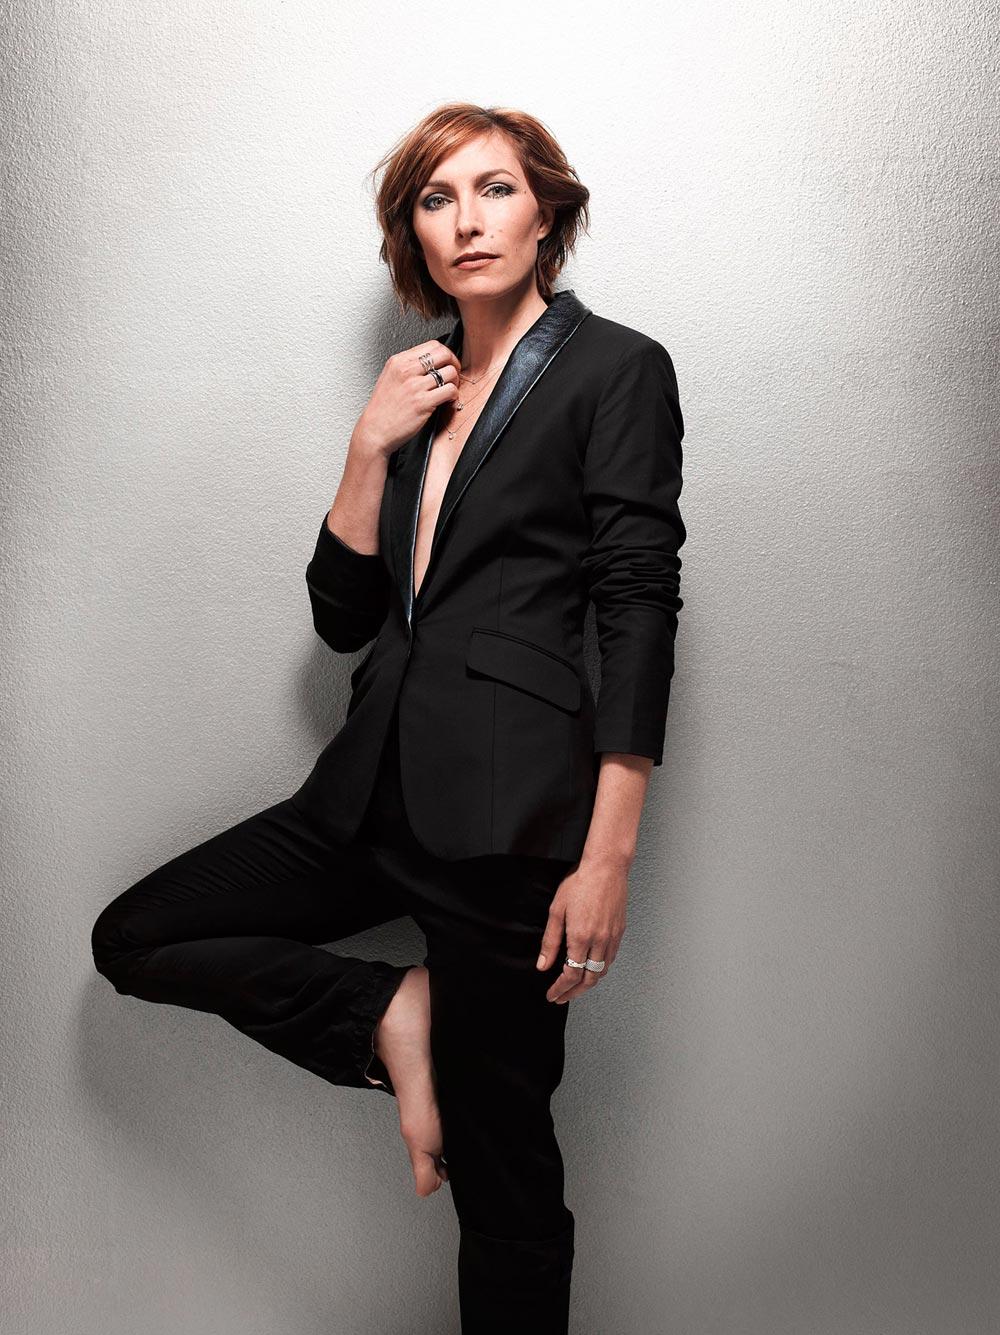 Claudia Karvan, The Sydney Magazine, 2013